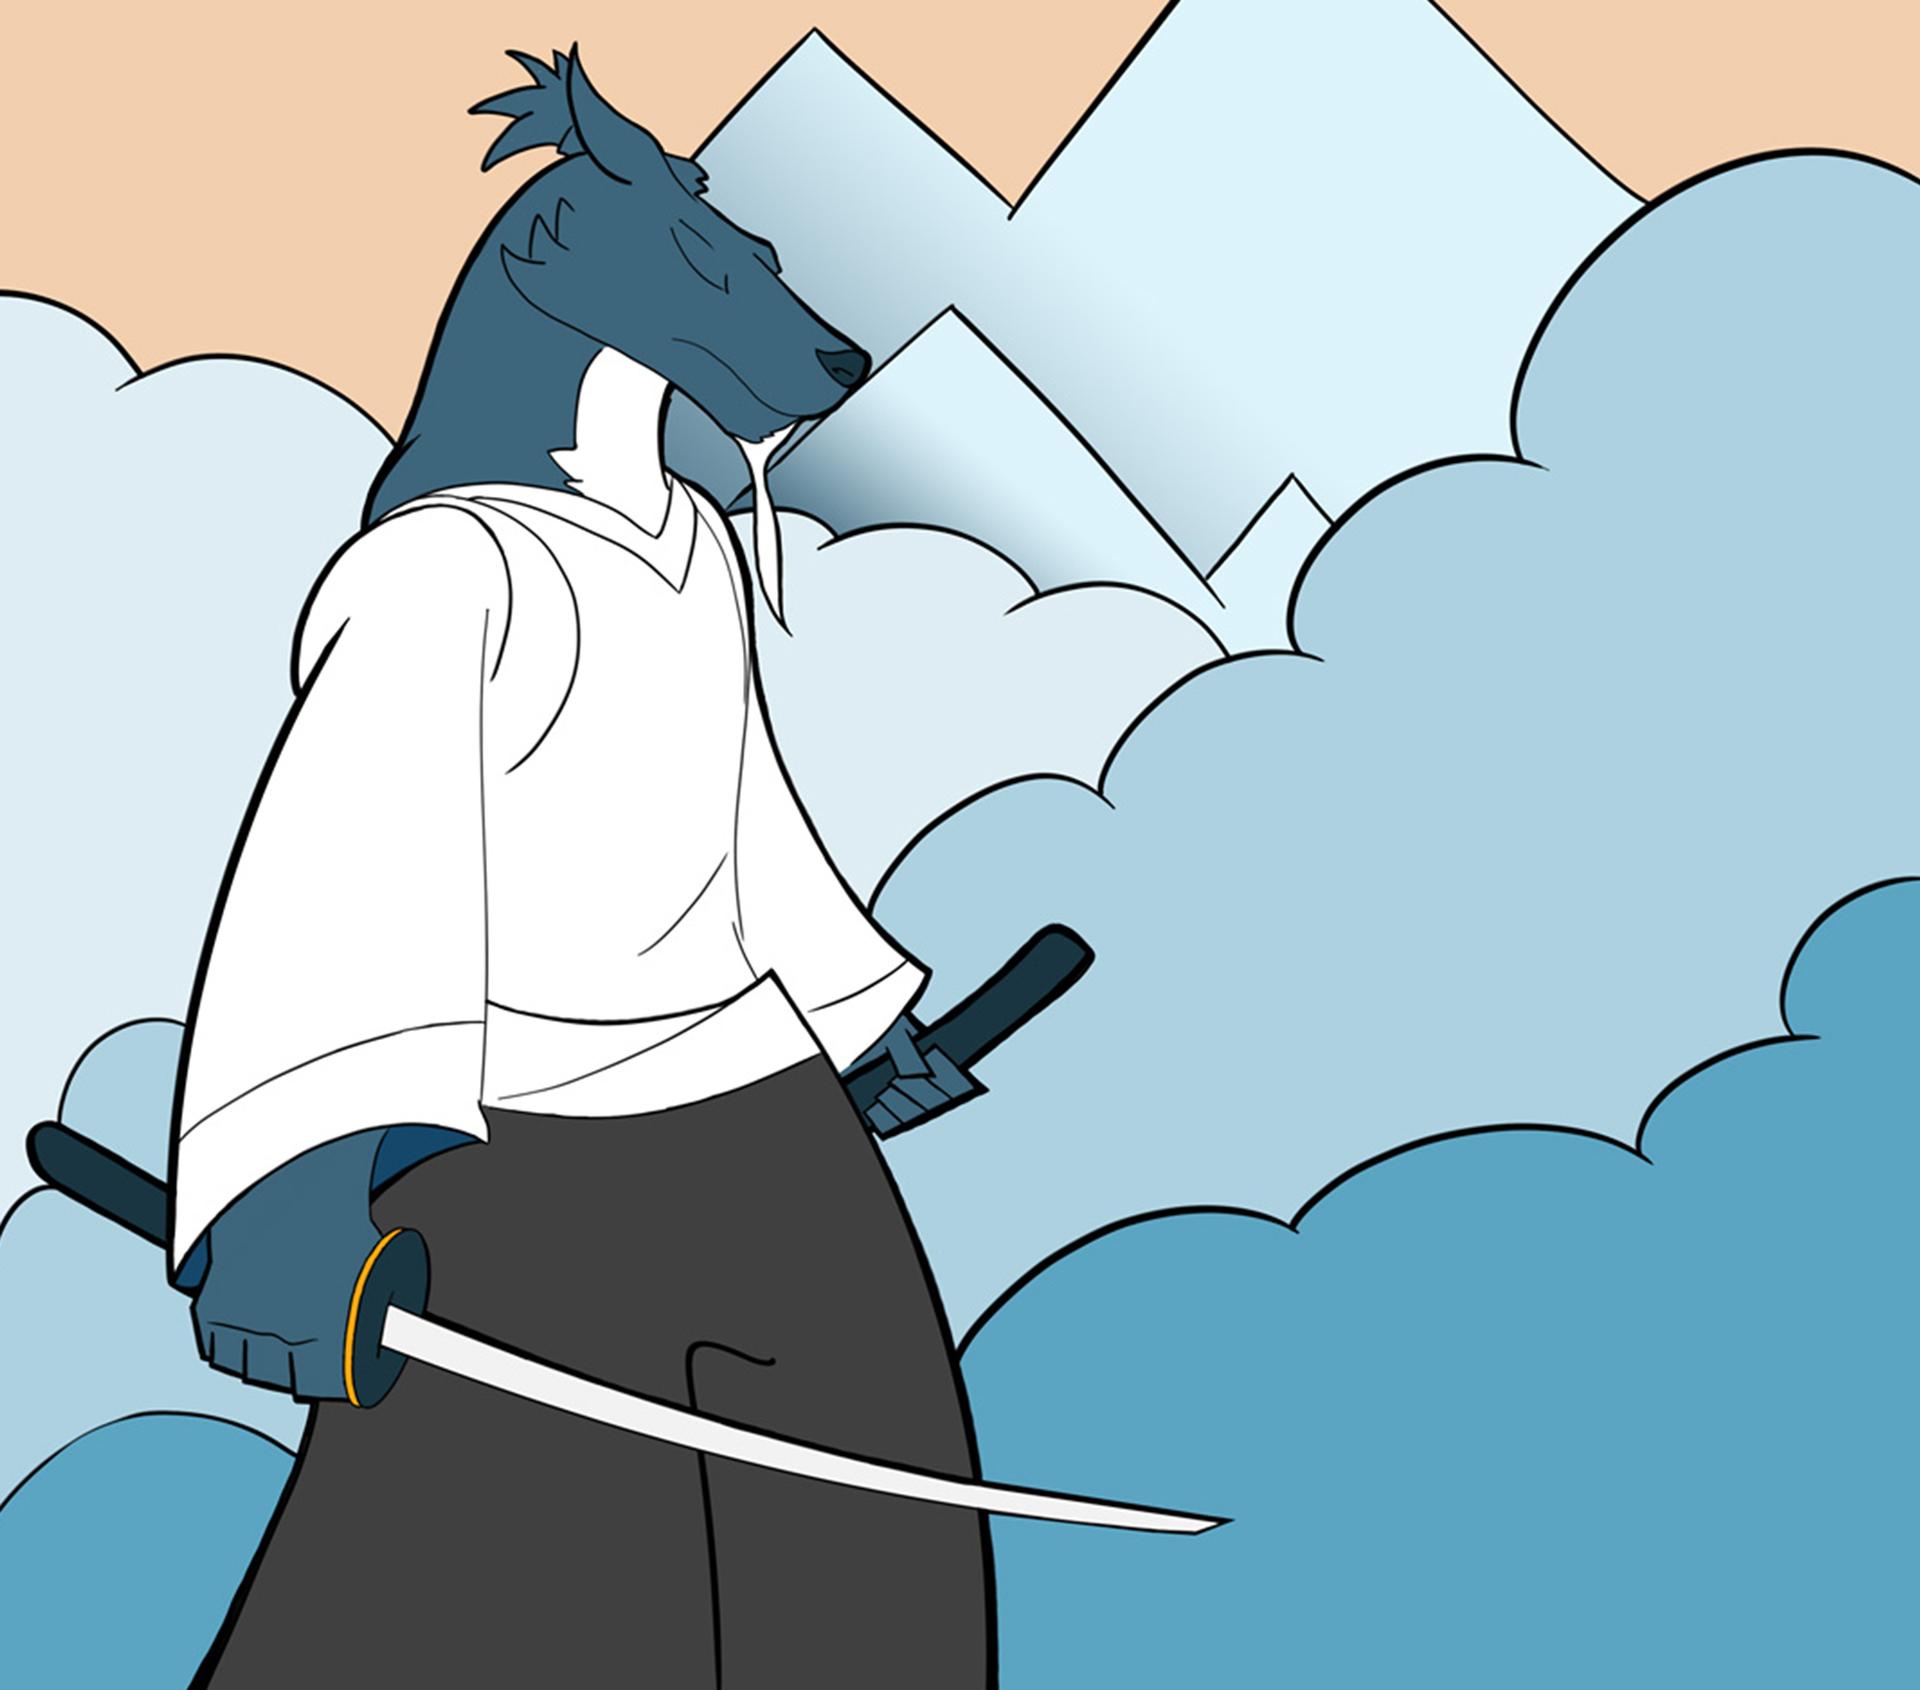 samurai-wolf-illustration-07.jpg